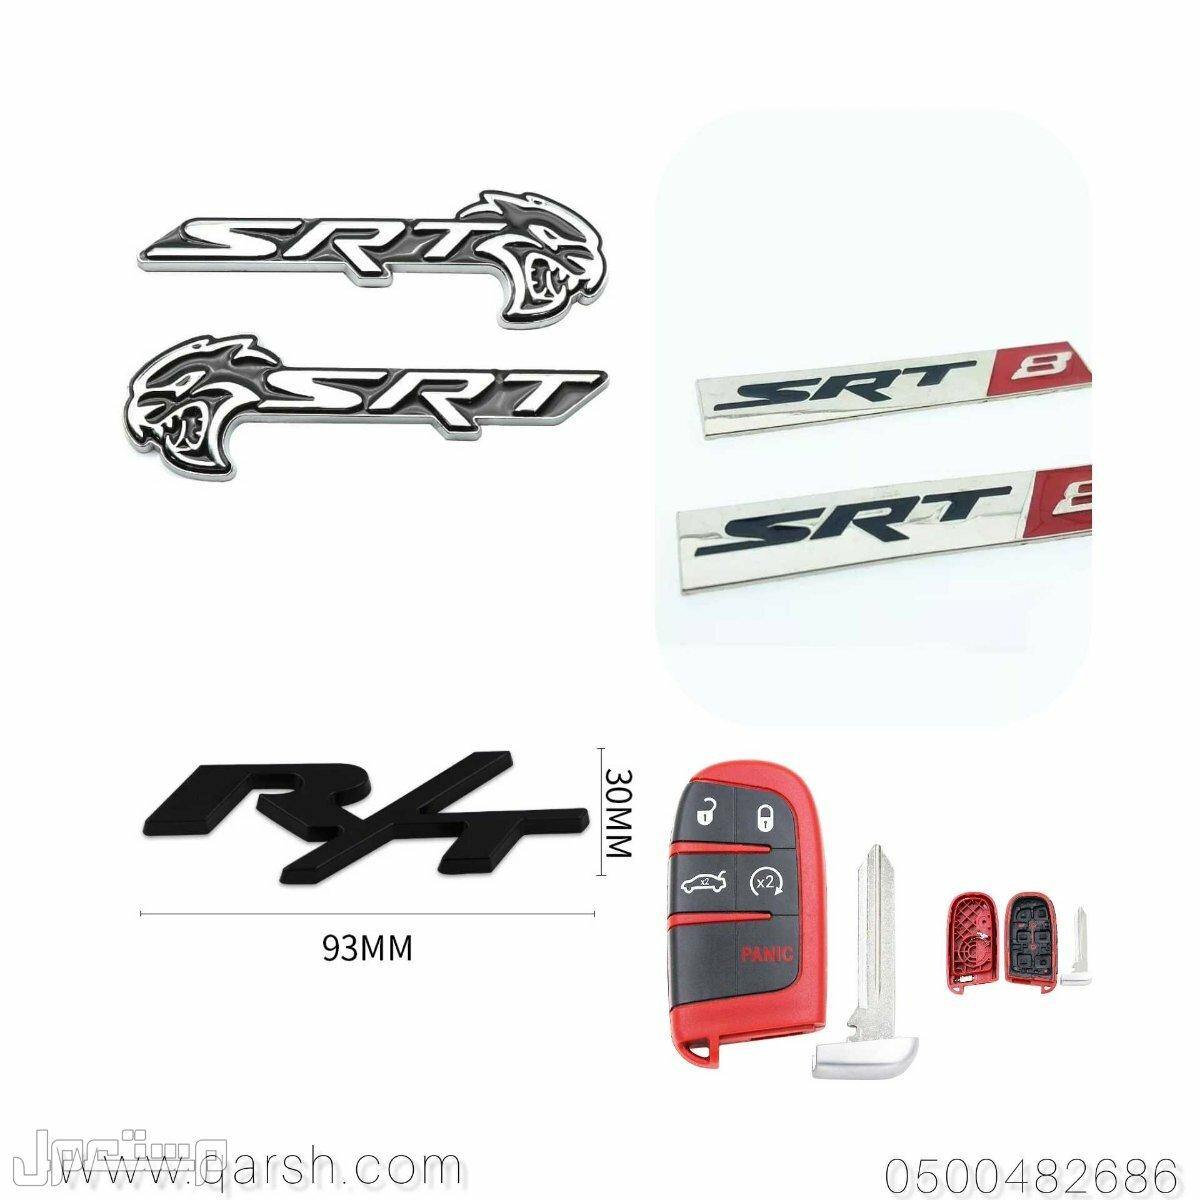 علامات و اكسسوارات دوج لكزس هونداي rt SRT